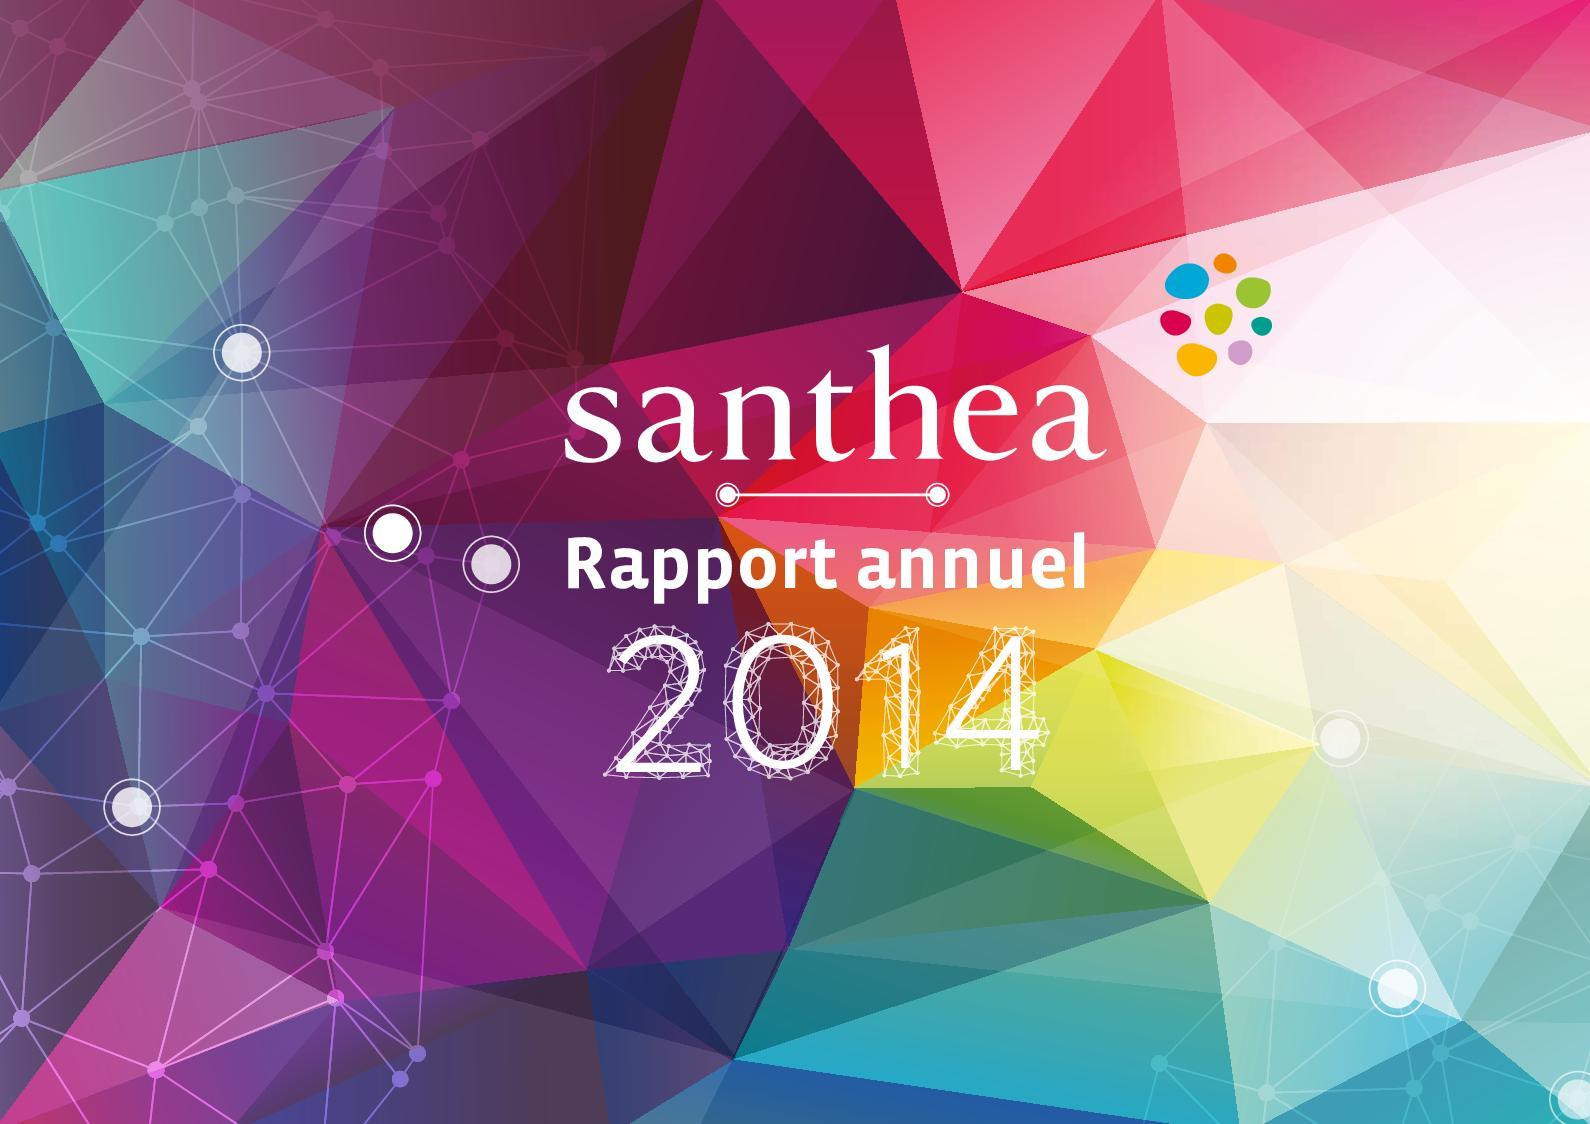 Calaméo santhea rapport 2014